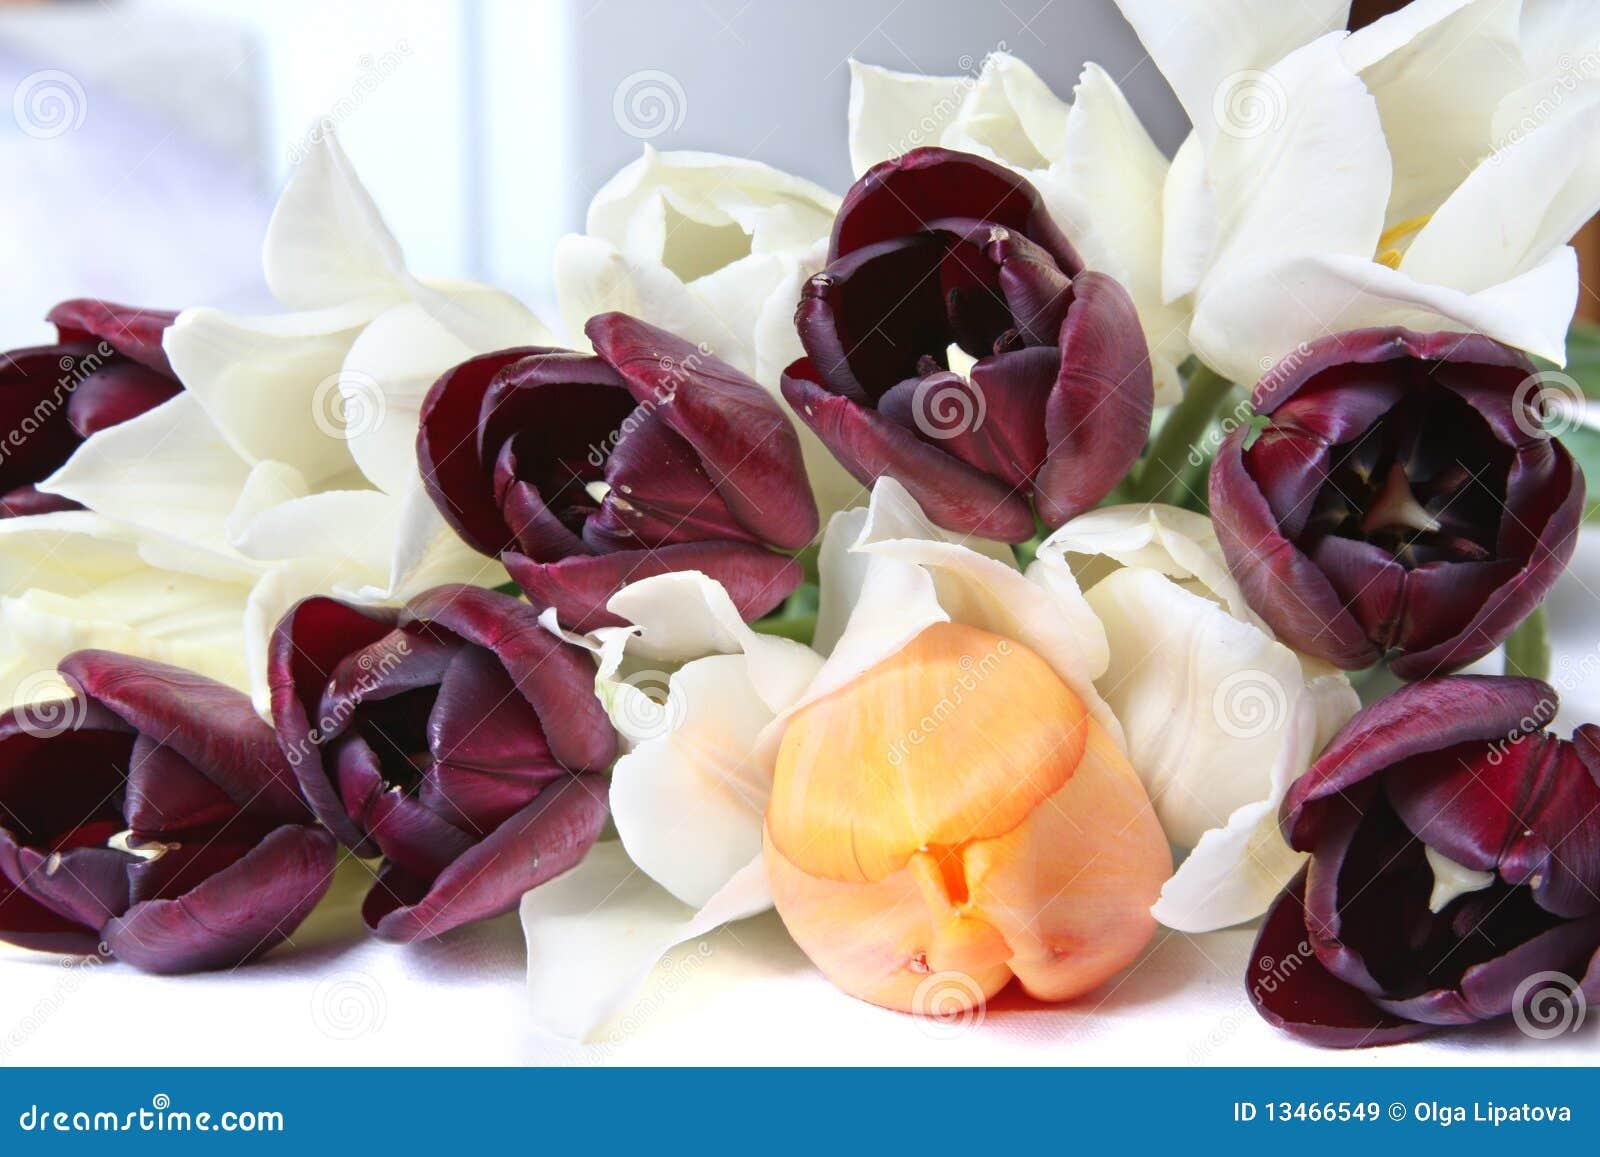 Tulipani bianchi arancioni e neri immagini stock libere for Tulipani arancioni